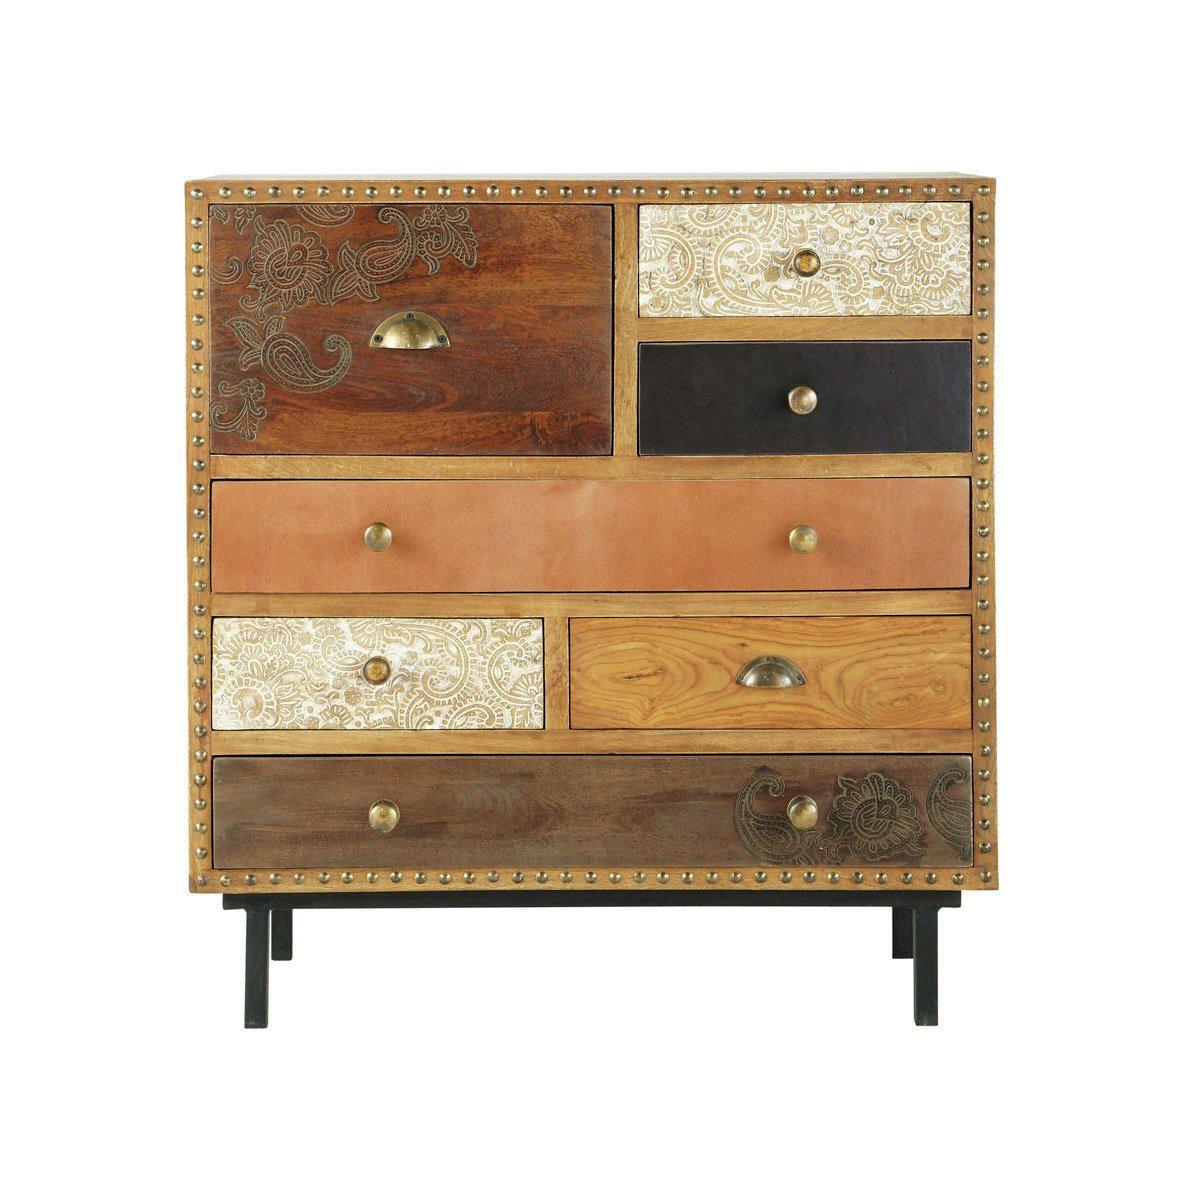 cabinet maison du monde danube maisons du monde with cabinet maison du monde stained solid. Black Bedroom Furniture Sets. Home Design Ideas